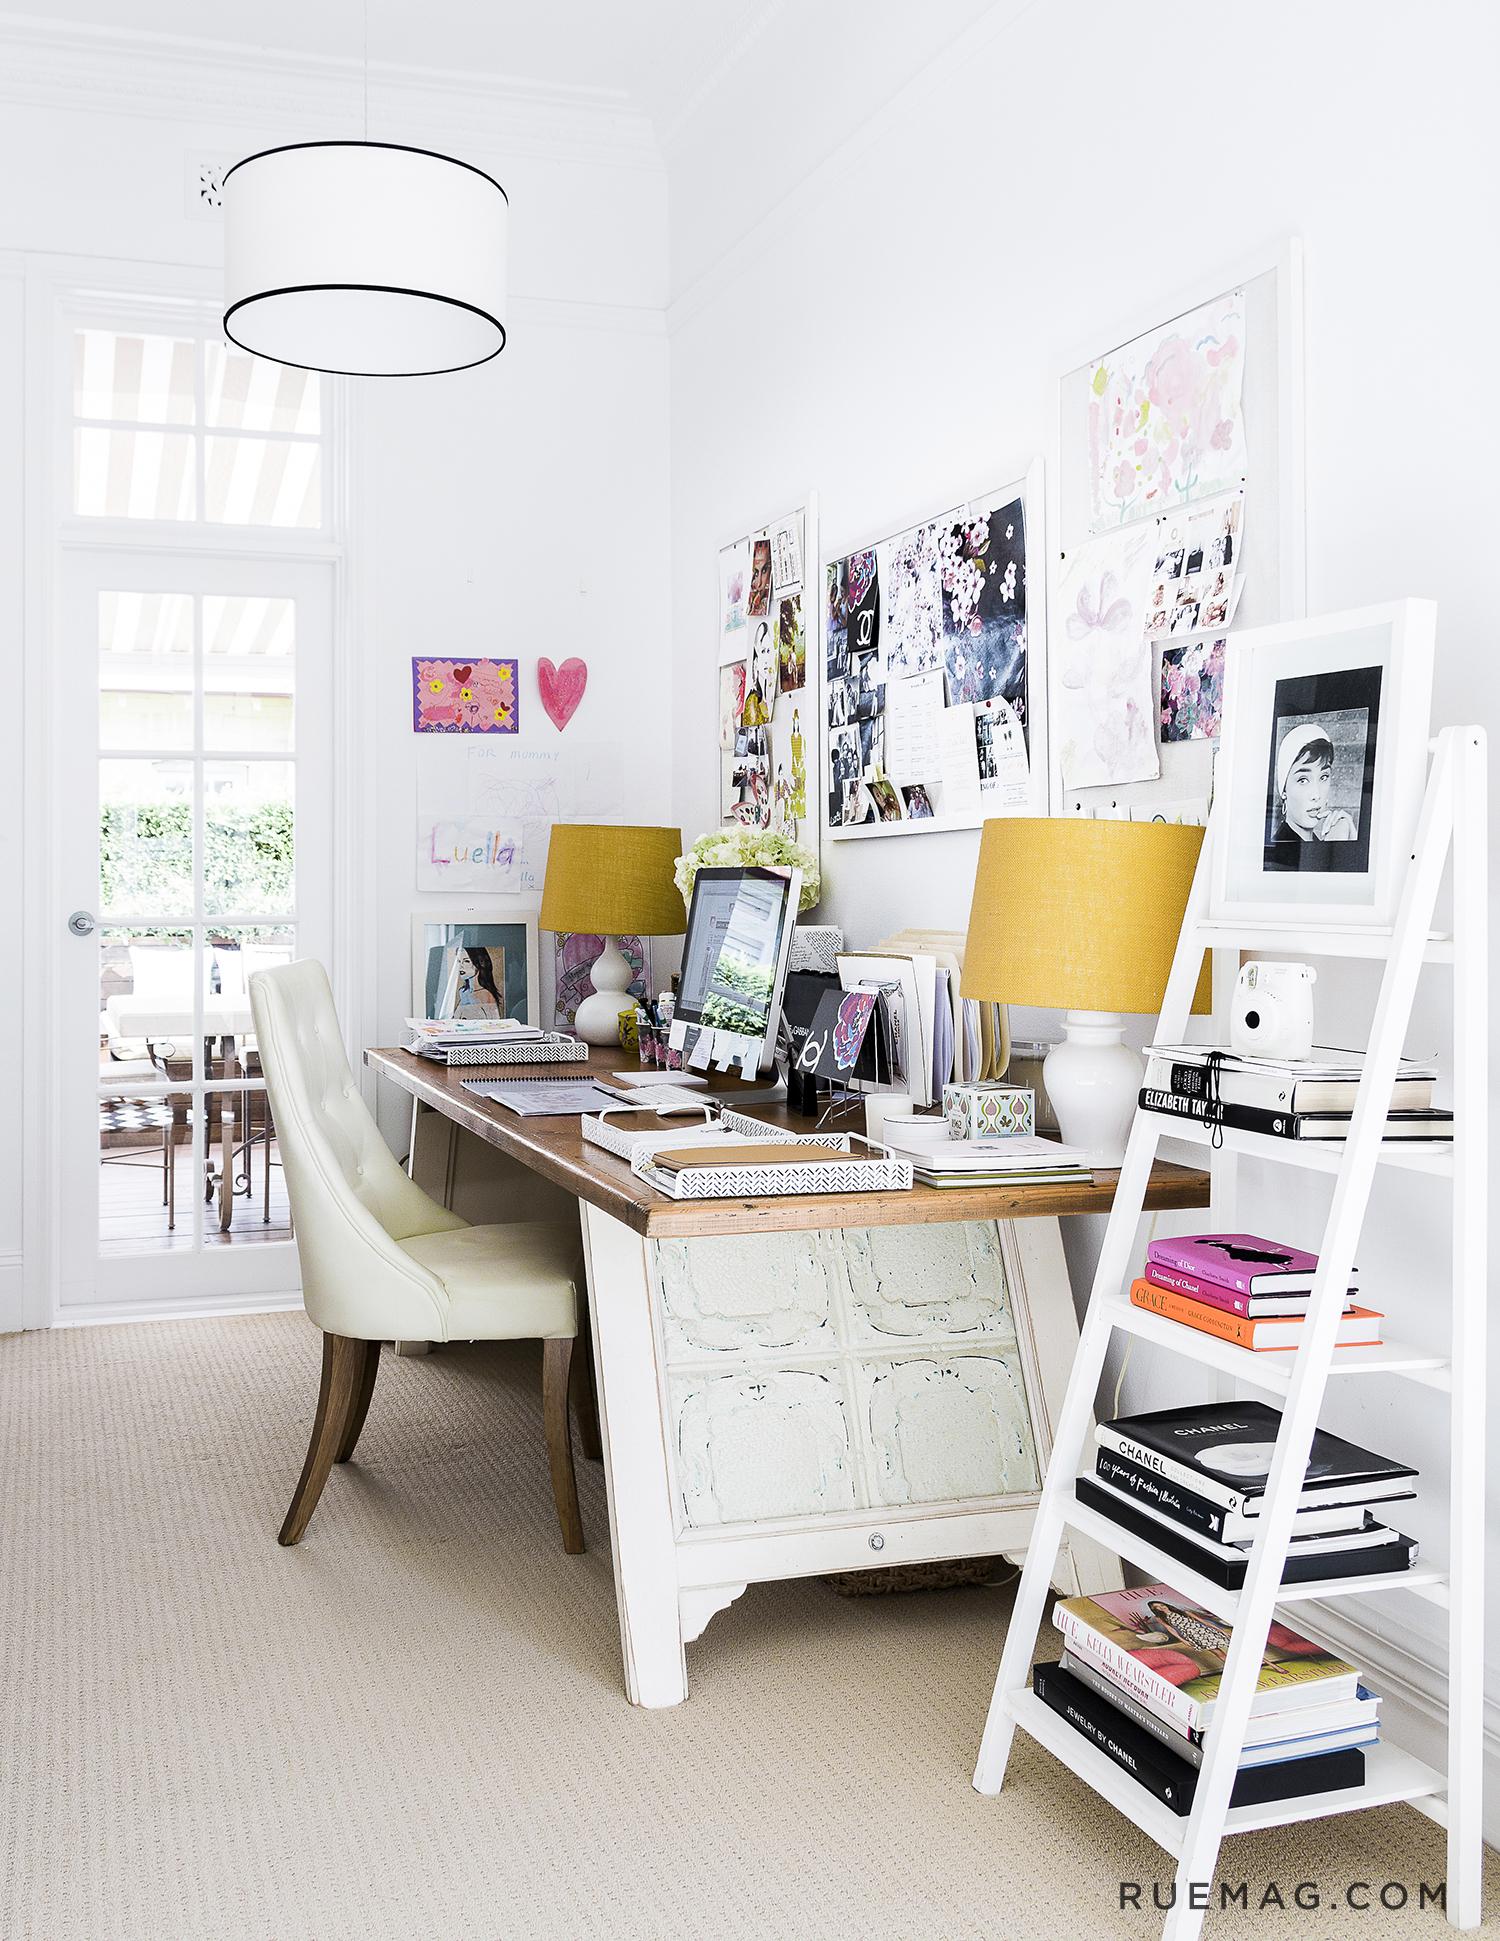 insp l inspired diy tumblr organization kristi gpfarmasi beil corner organiz shaped and pinterest on decor anne youtube desk